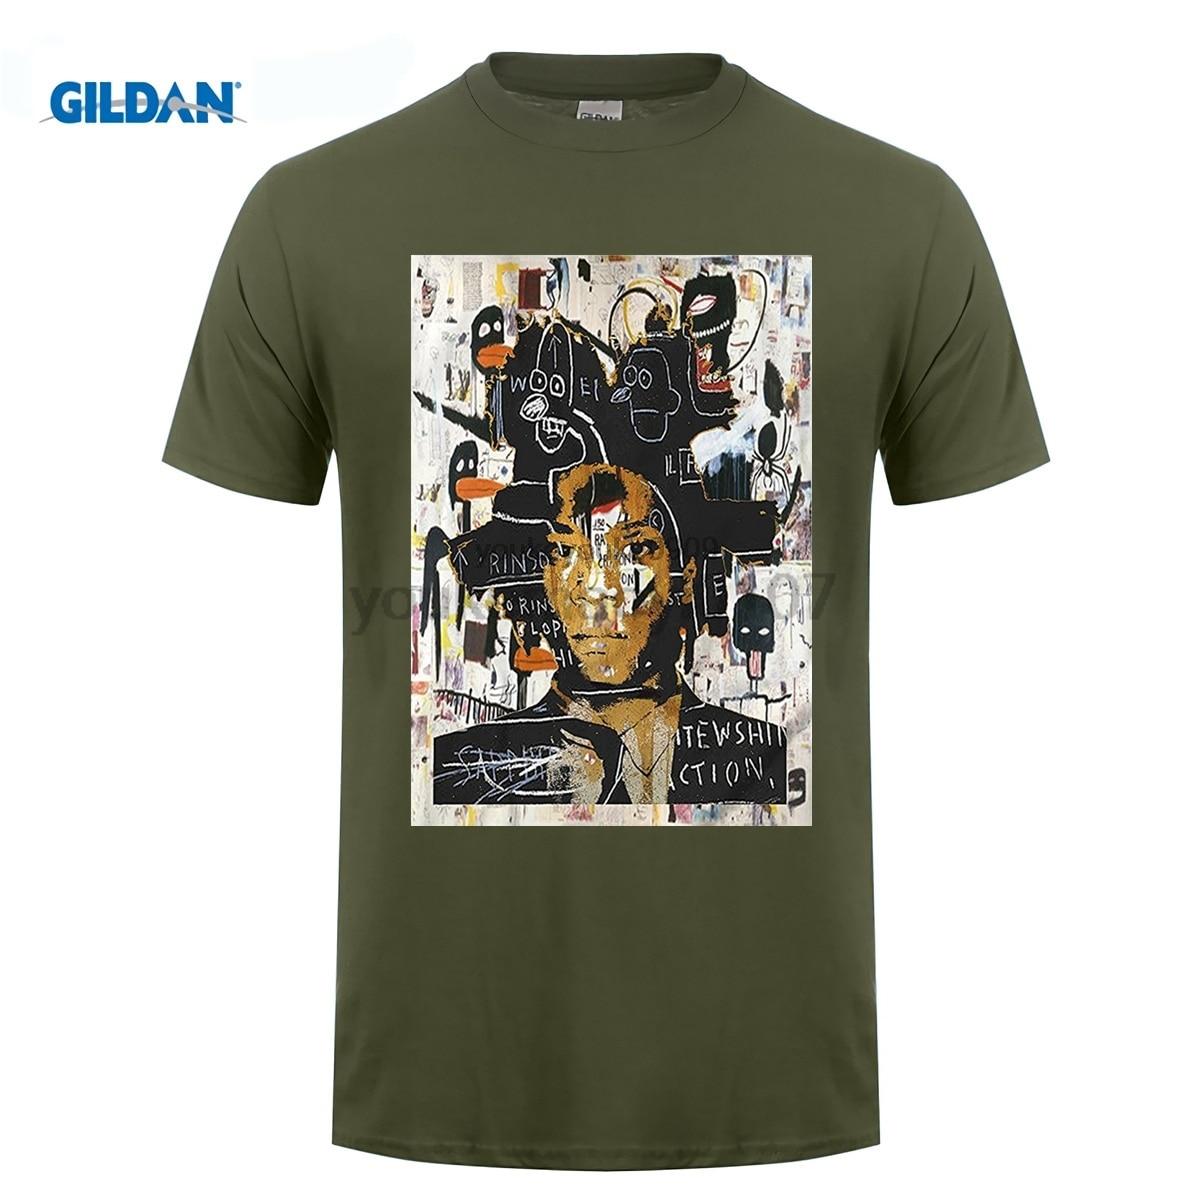 GILDAN New Arrival Gildan Crew Neck Short-Sleeve Tall Jean Michel Basquiat Self Portrait T Shirt